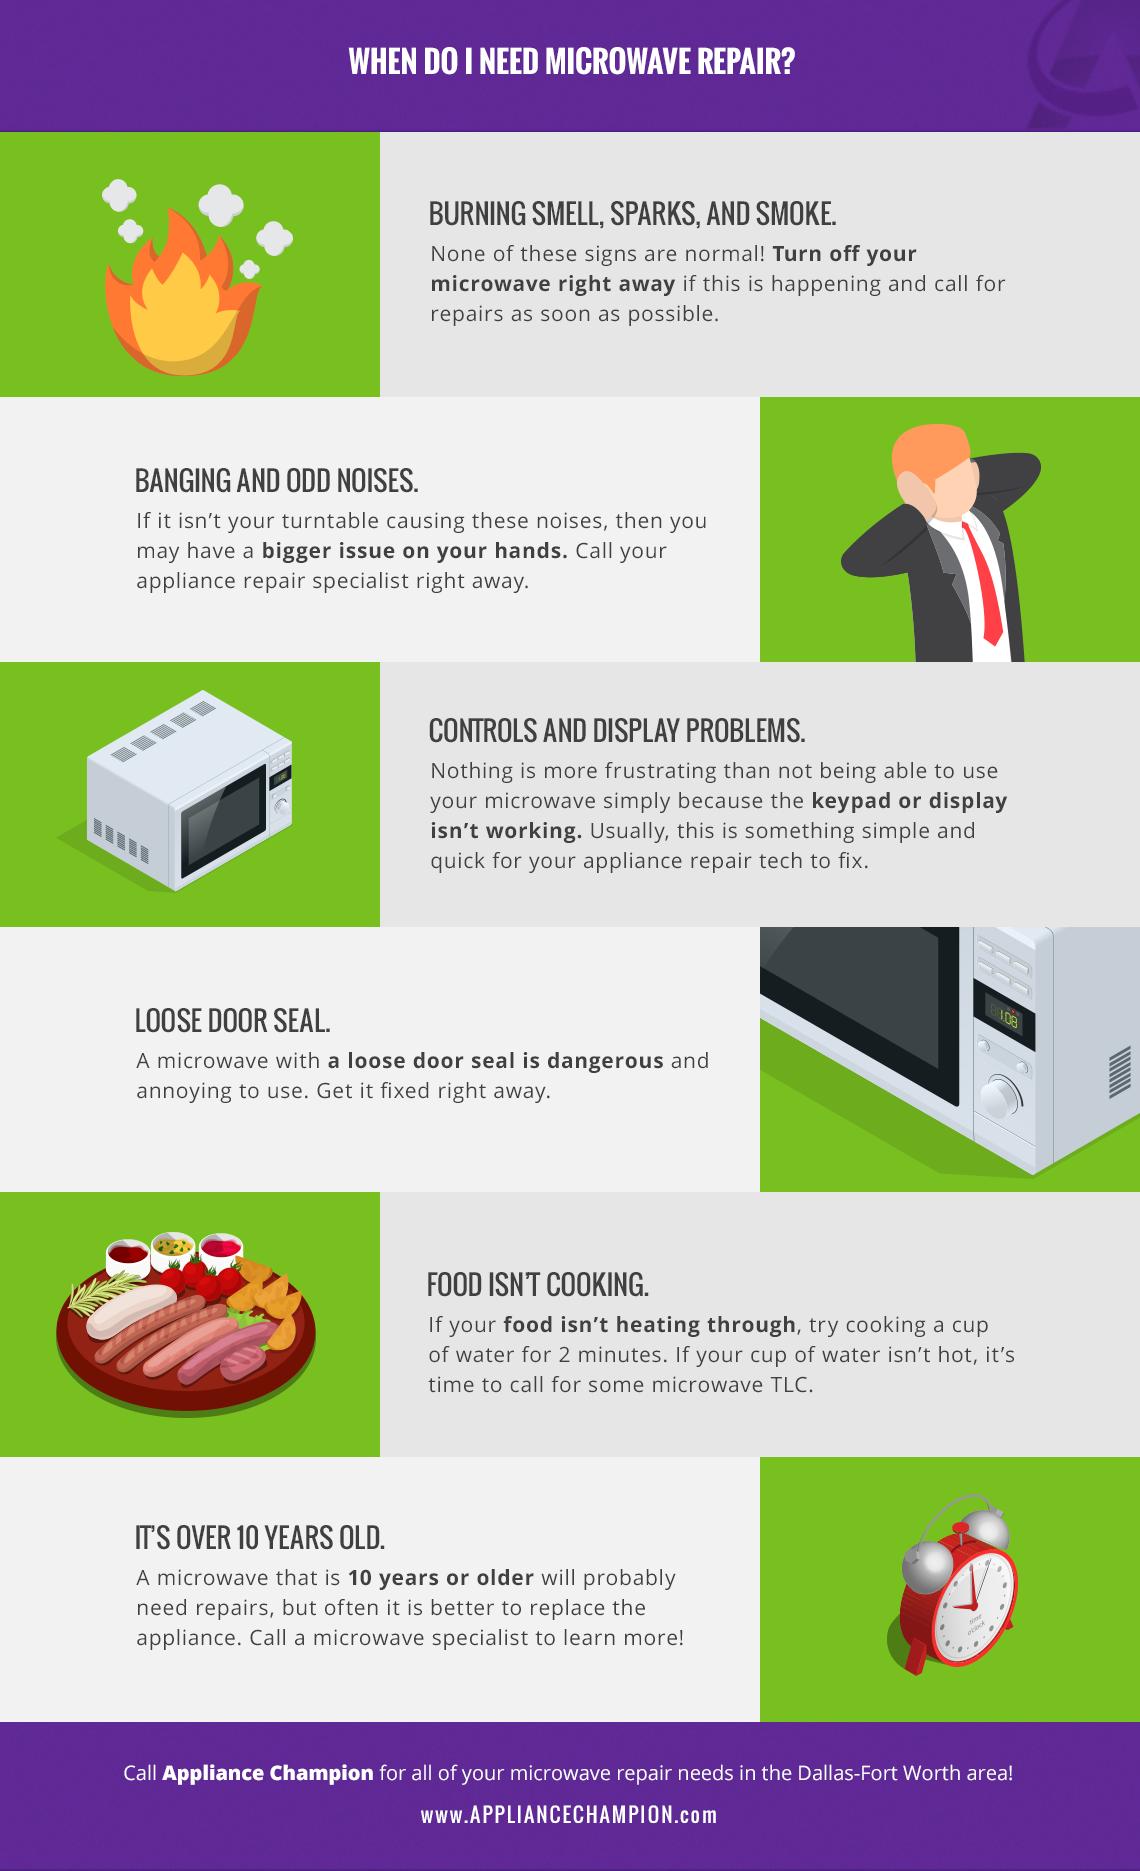 infographic-microwaverepair-5b23de18eb1a